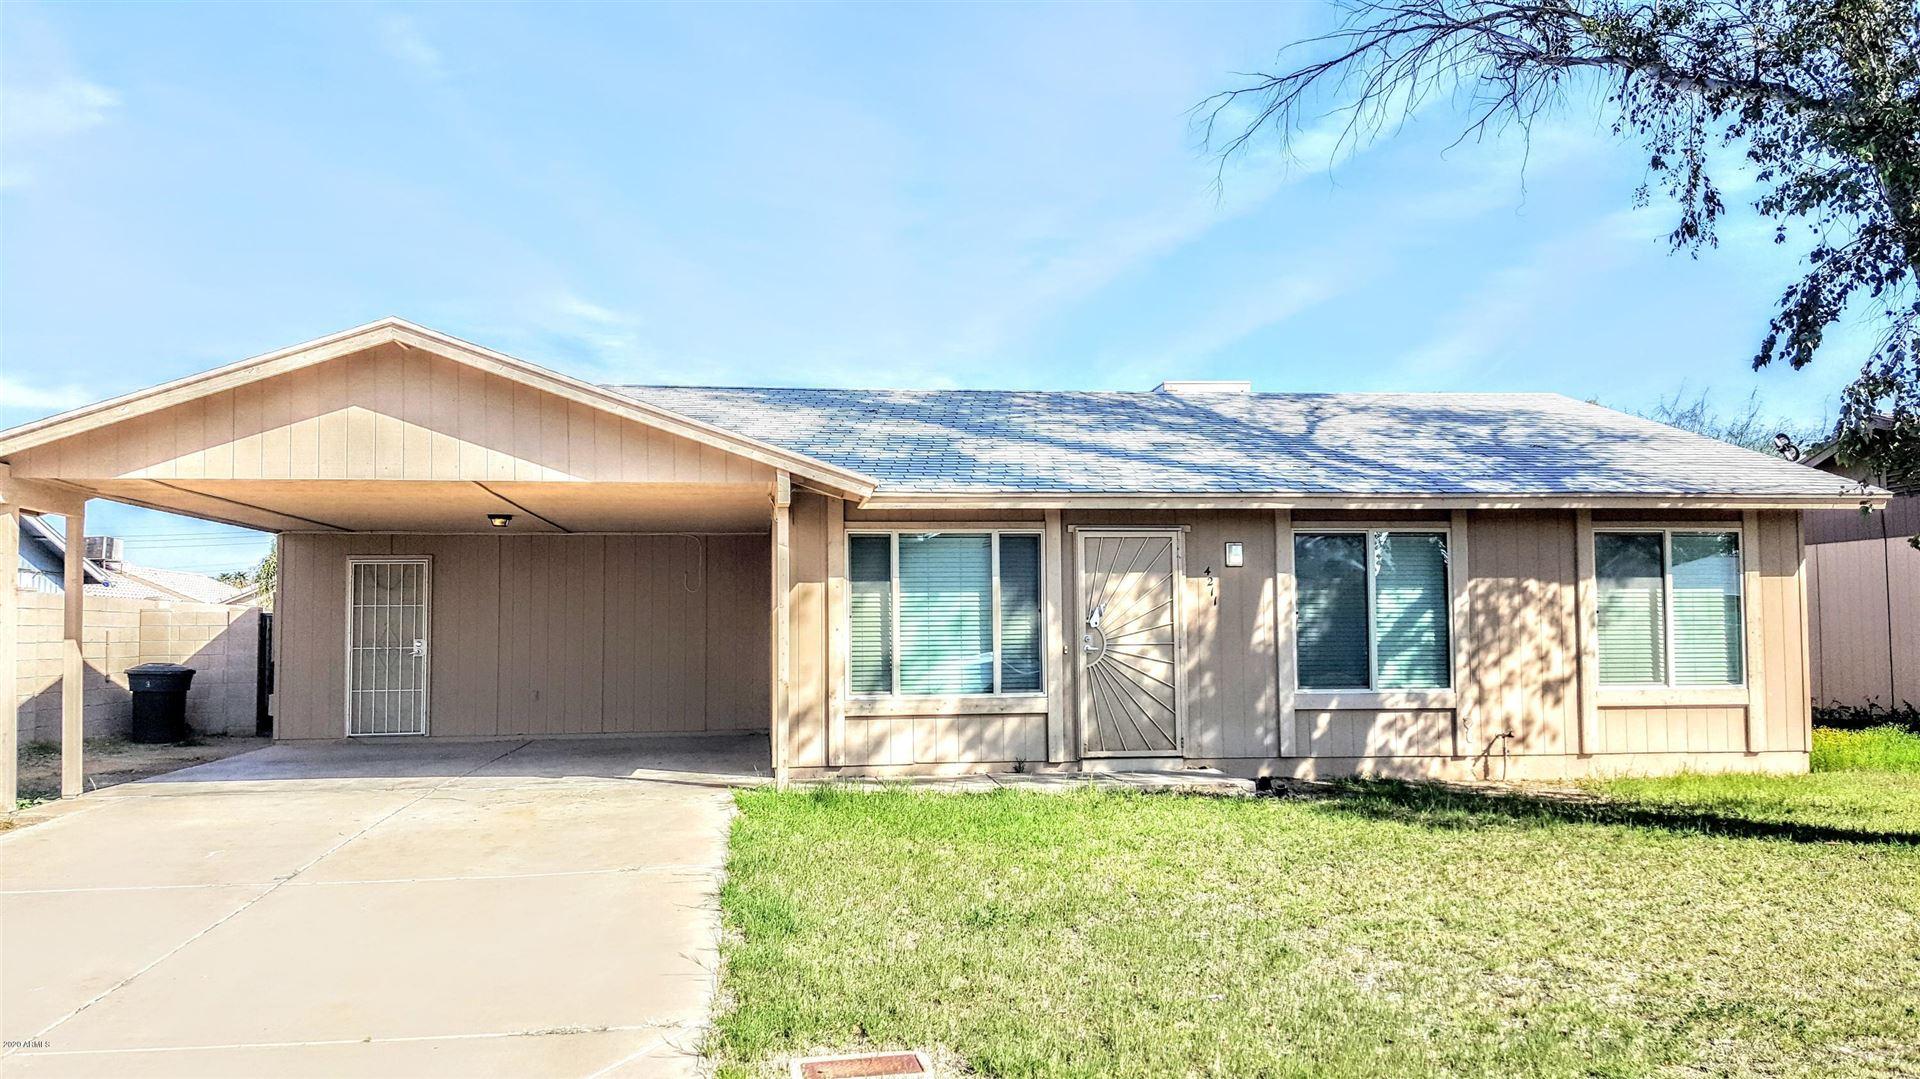 Property Image Of 4211 N 108Th Avenue In Phoenix, Az